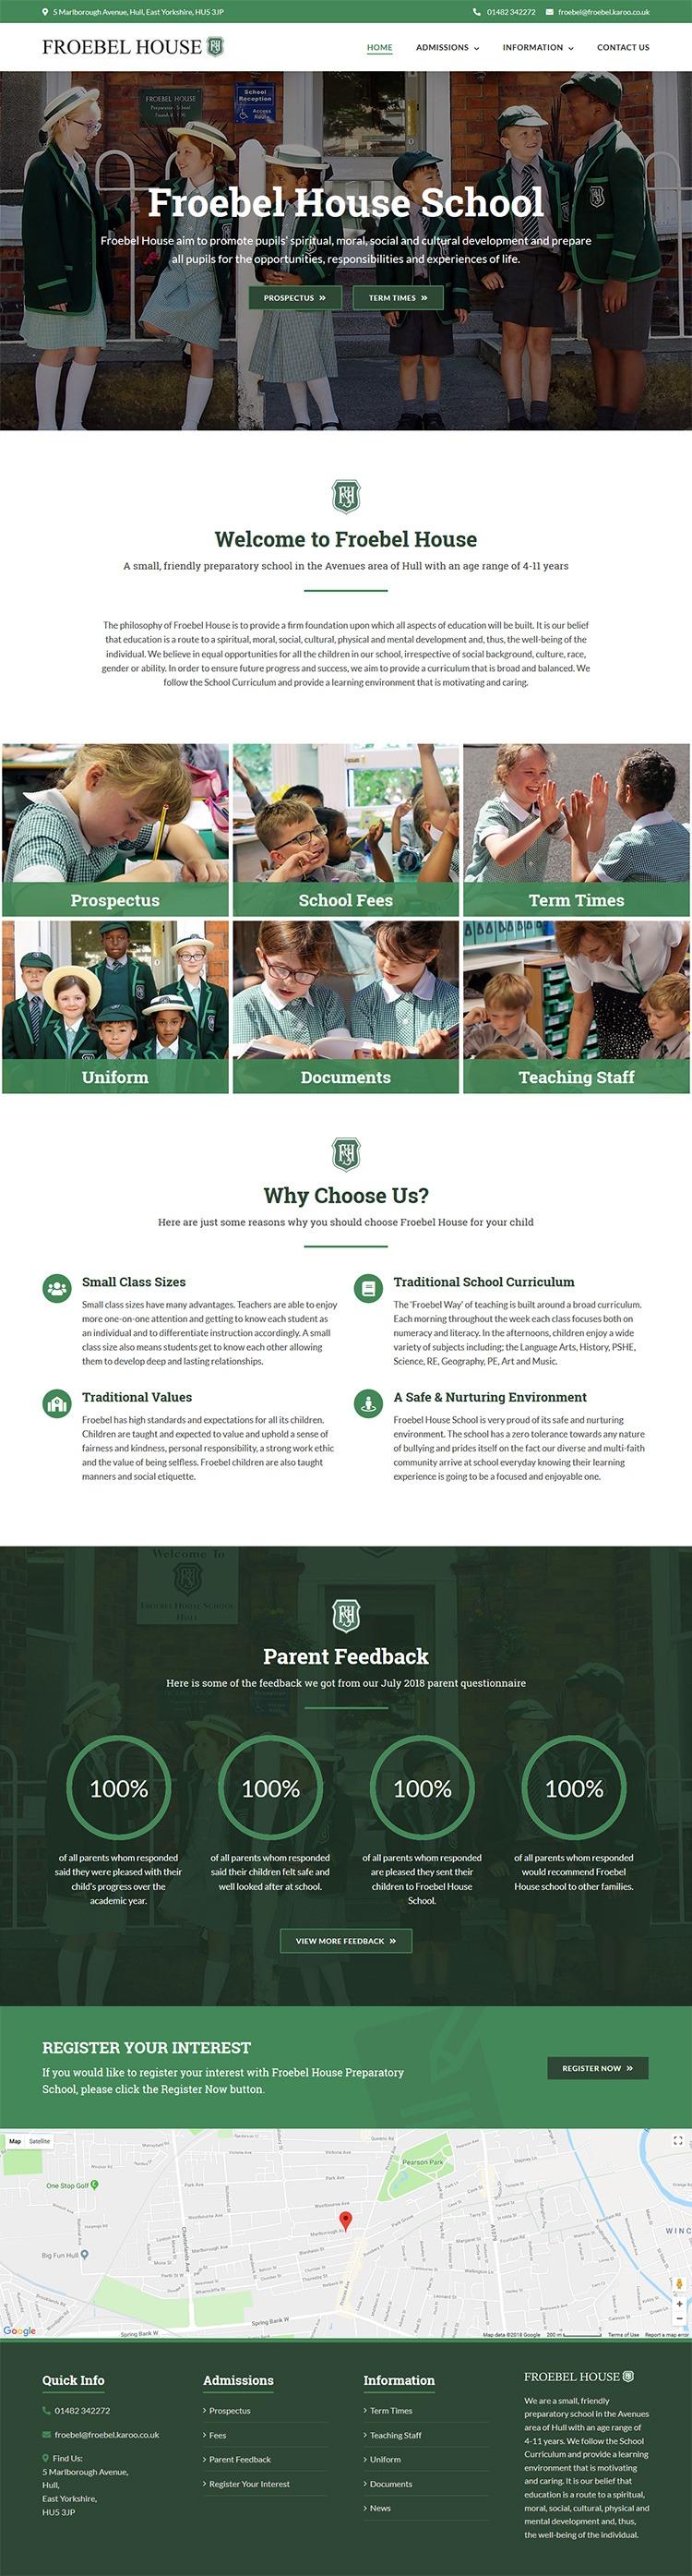 Froebel House website layout